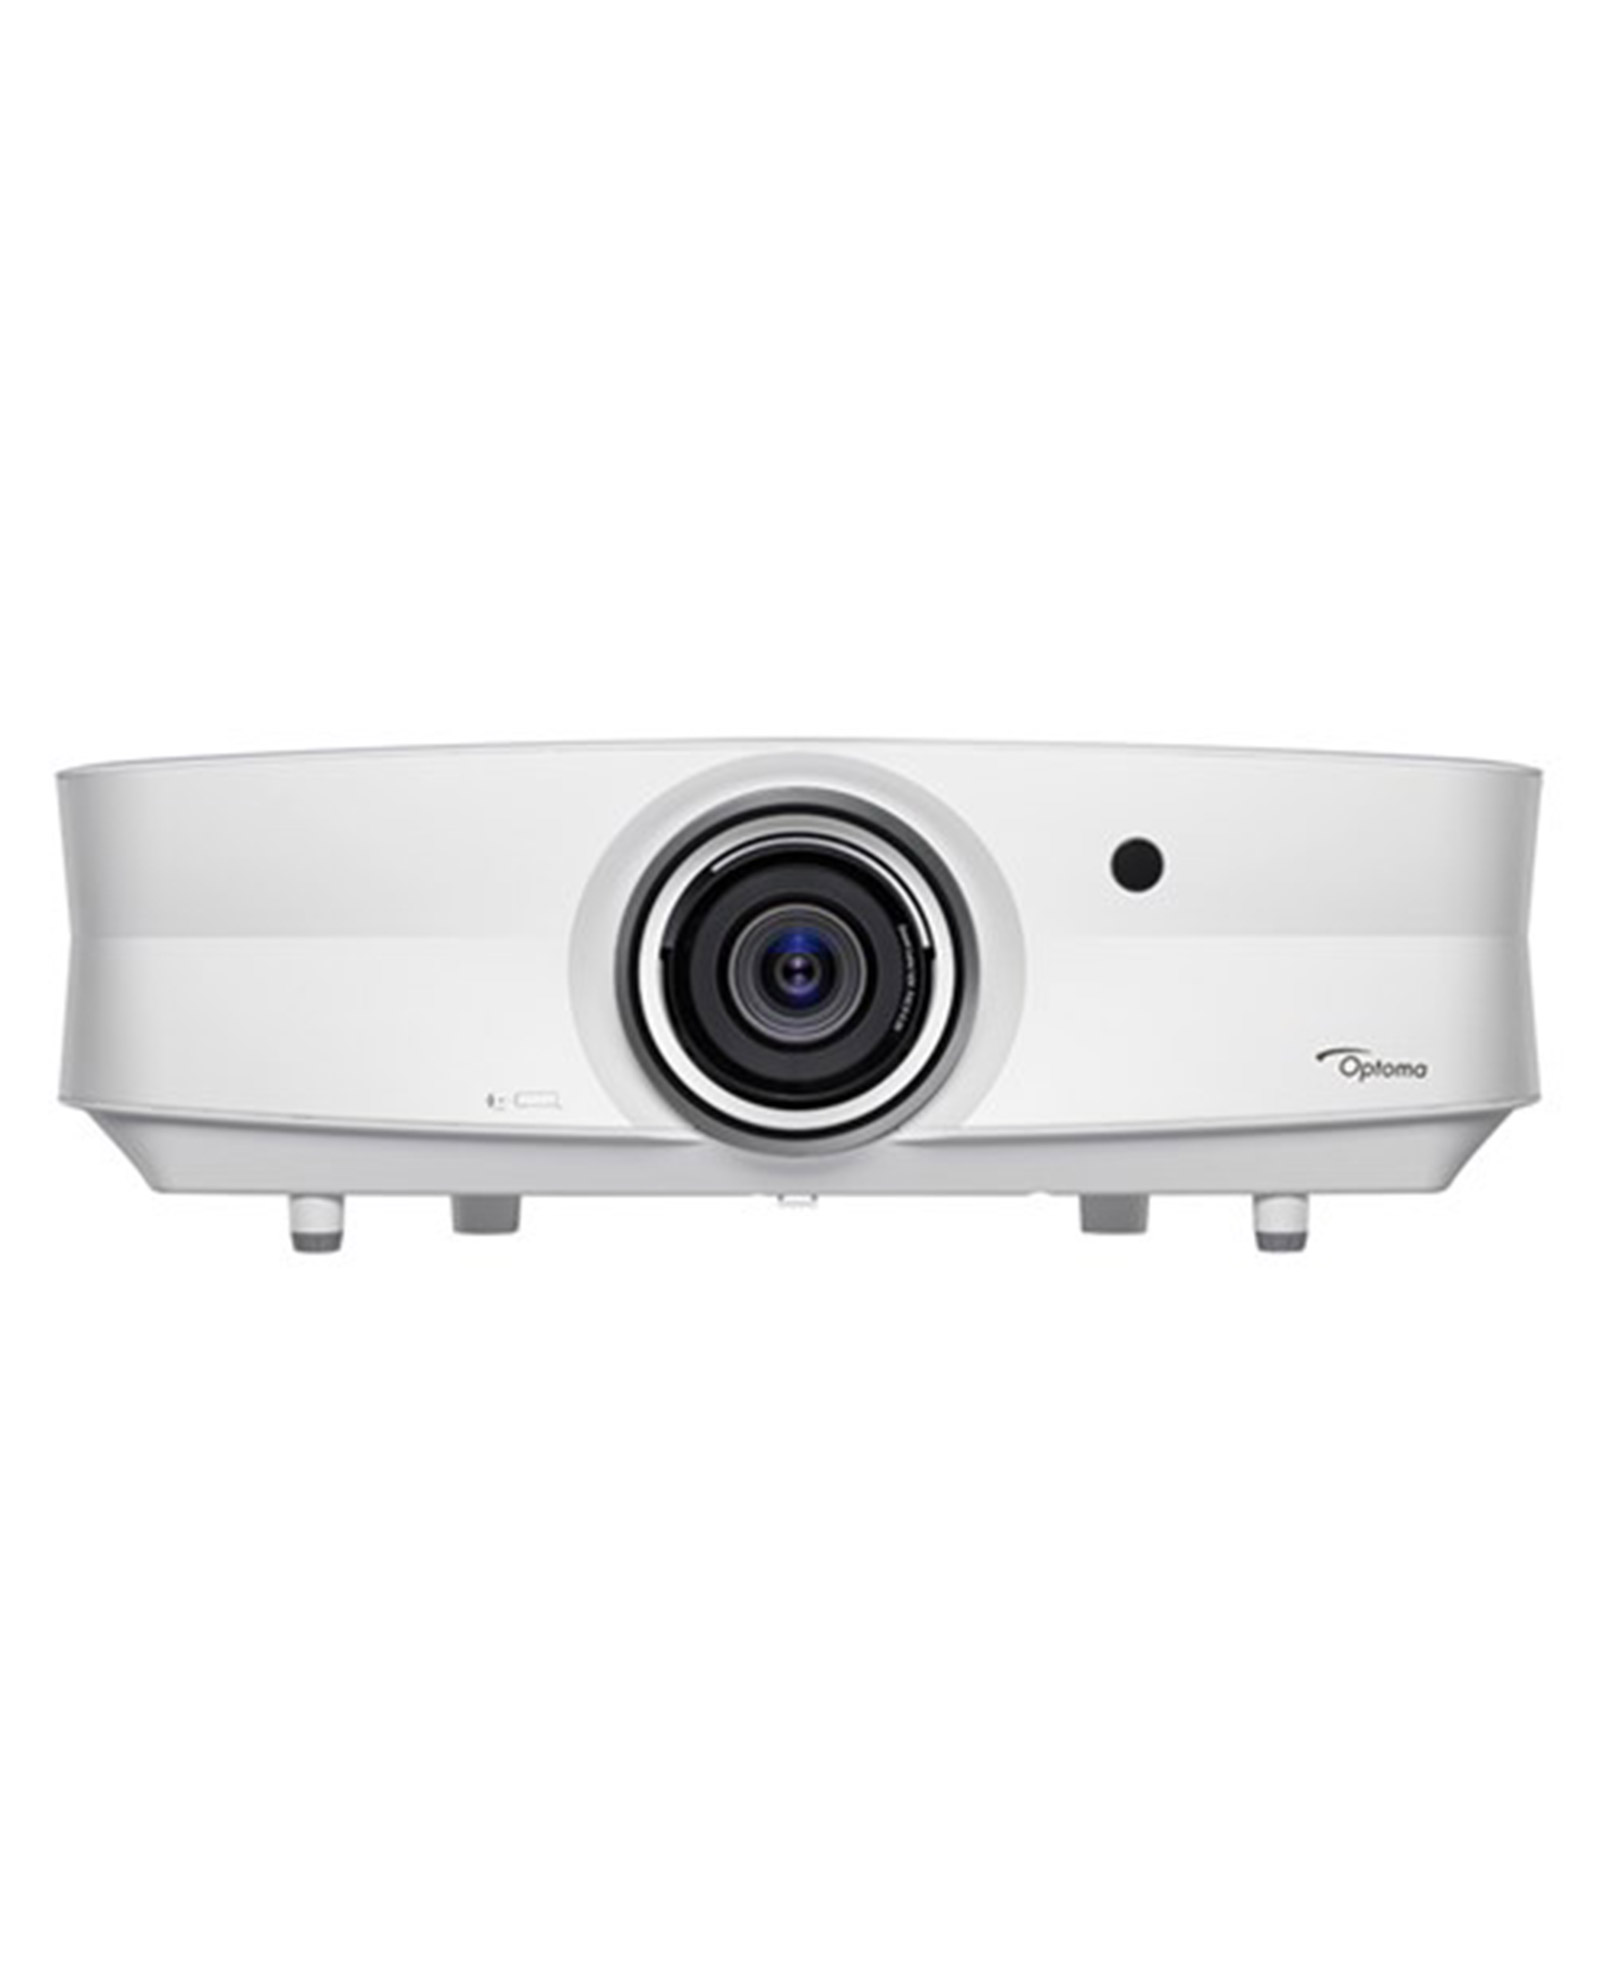 Optoma Zk507 5000 Lumens 2000000 1 Contrast 4k Laser Projector